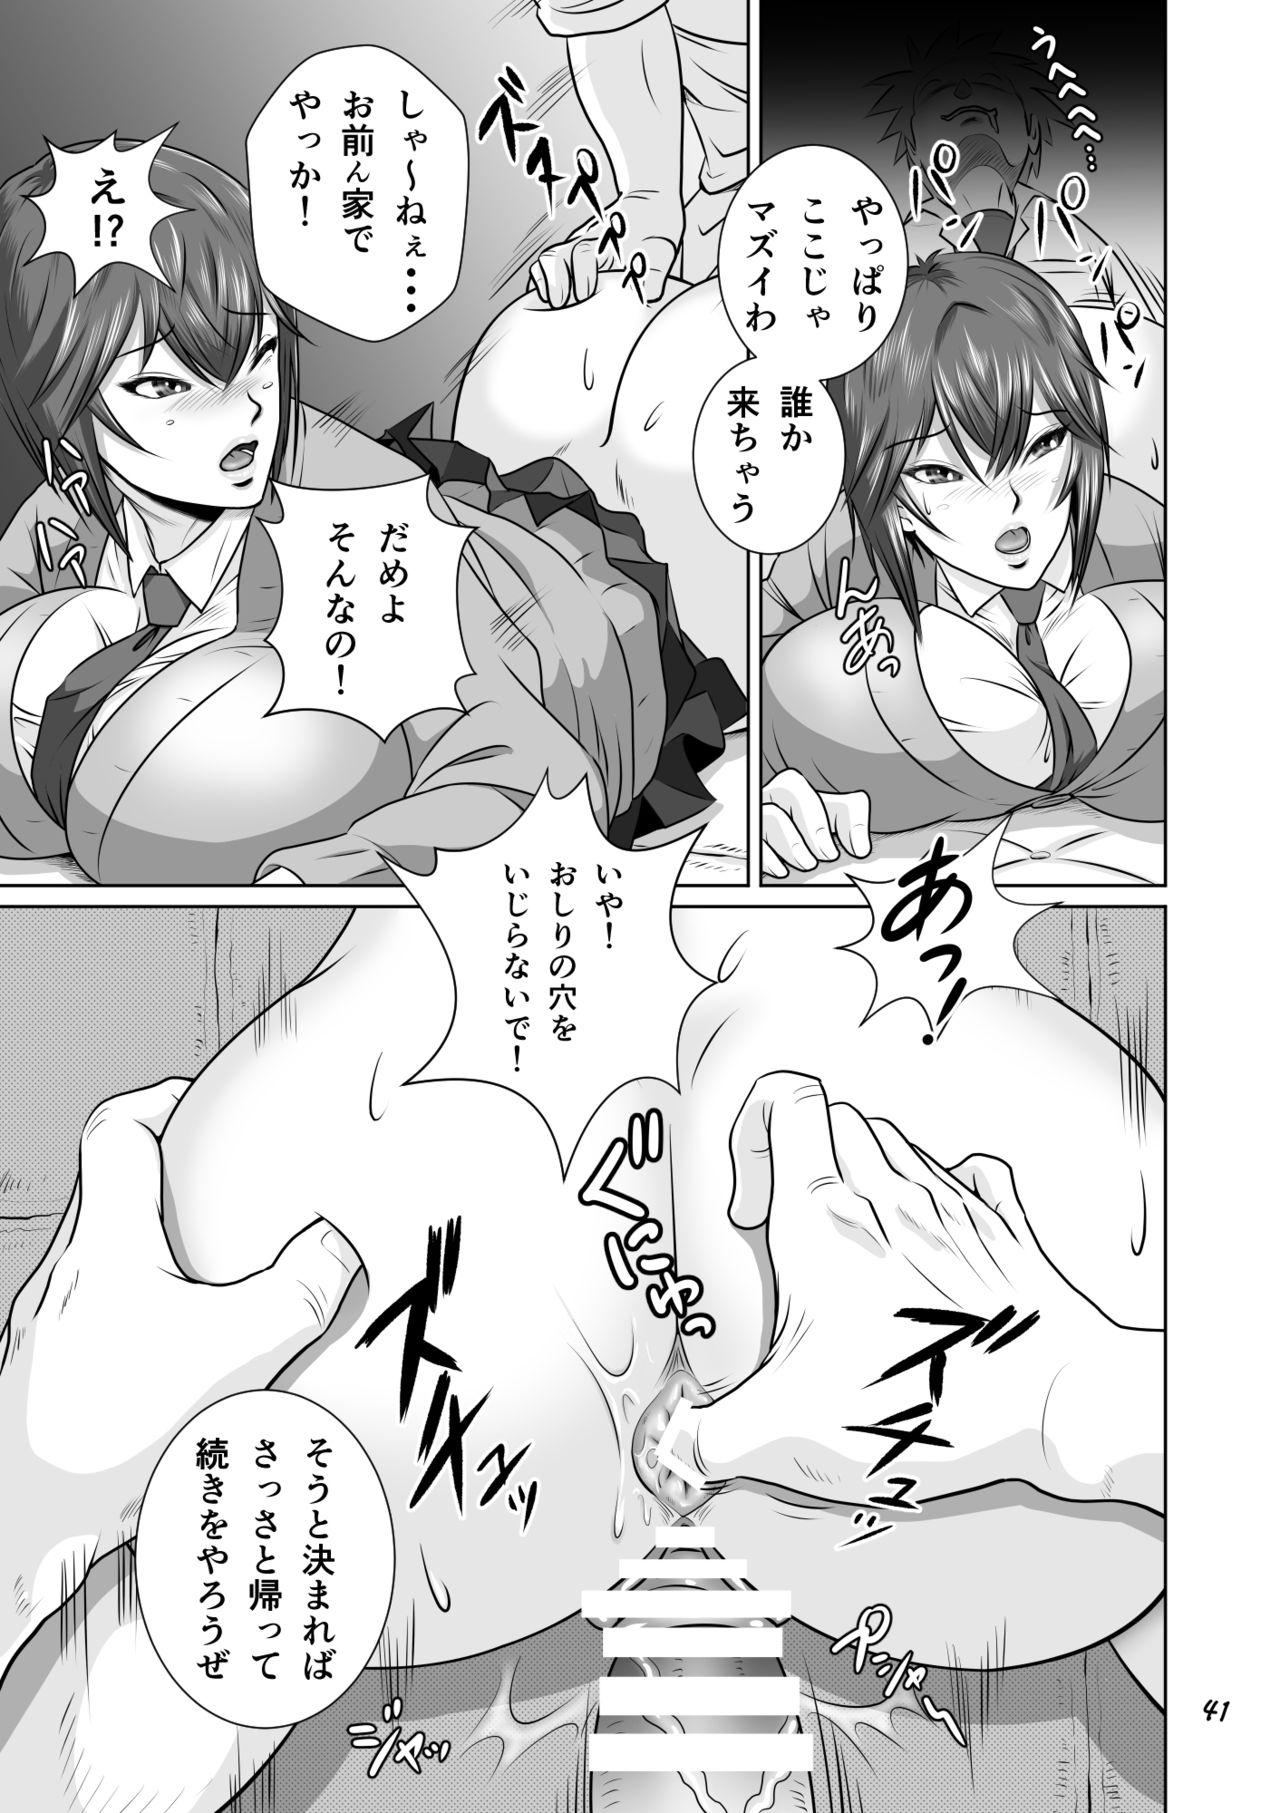 Netorare Osananajimi Haruka-chan Kiki Ippatsu!! 41